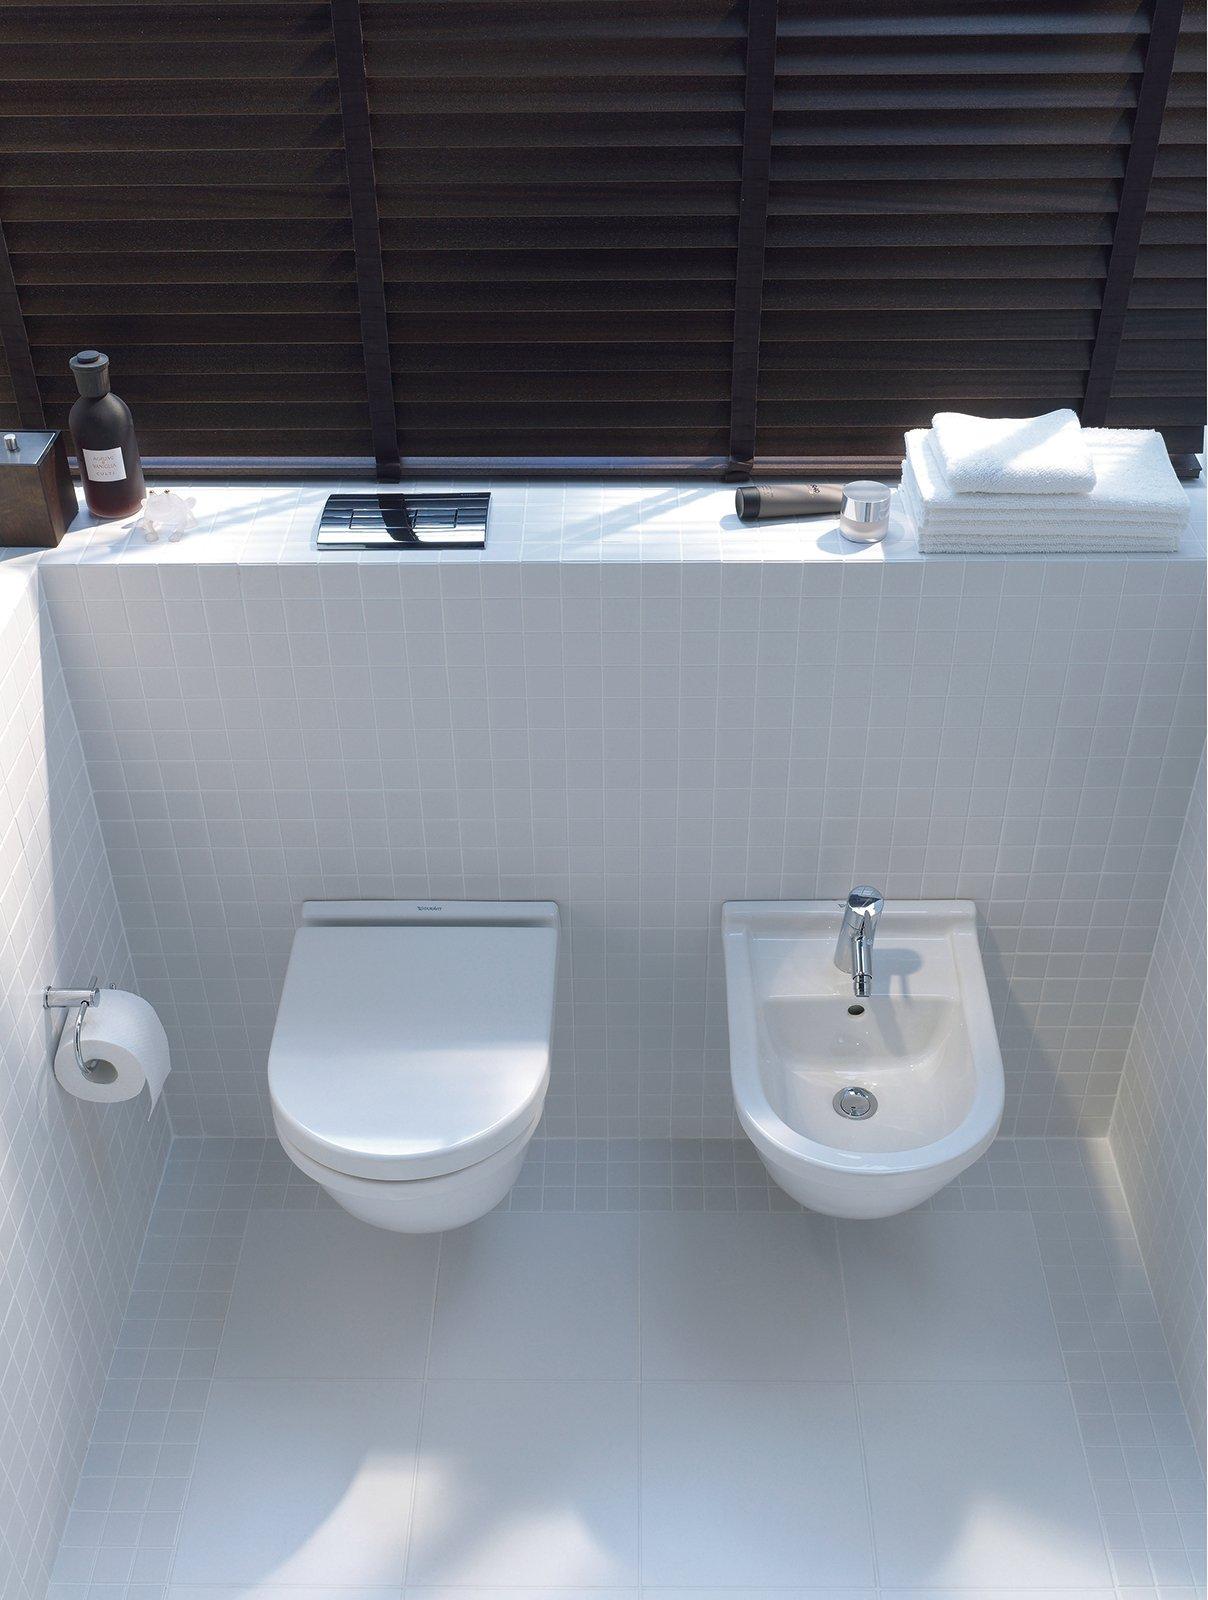 Sanitari dimensioni ridotte termosifoni in ghisa scheda - Sanitari bagno dimensioni ...